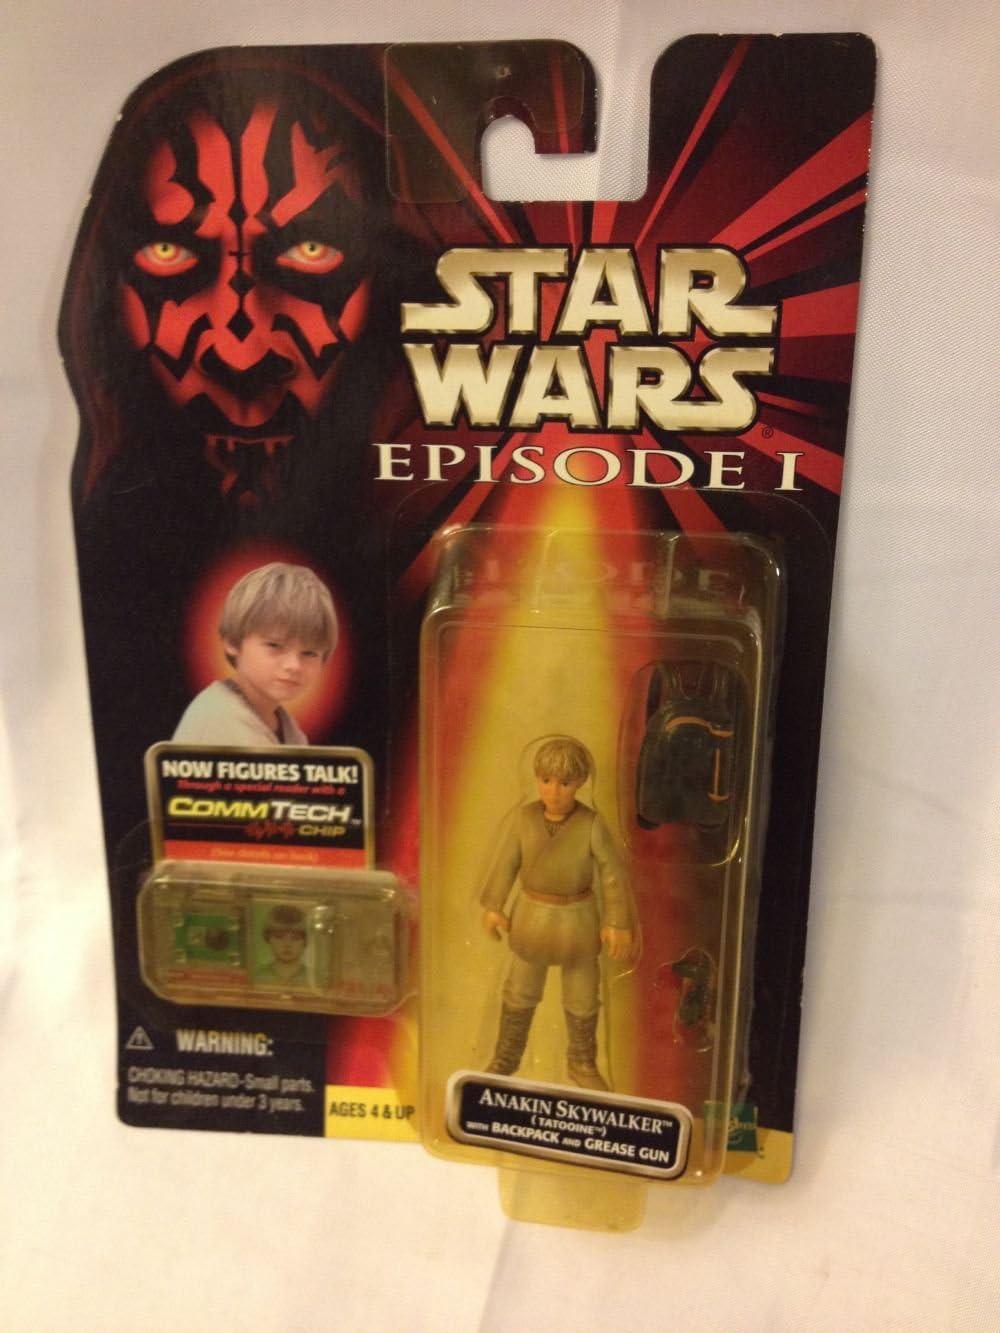 Star Wars - Anakin Skywalker Action Figure